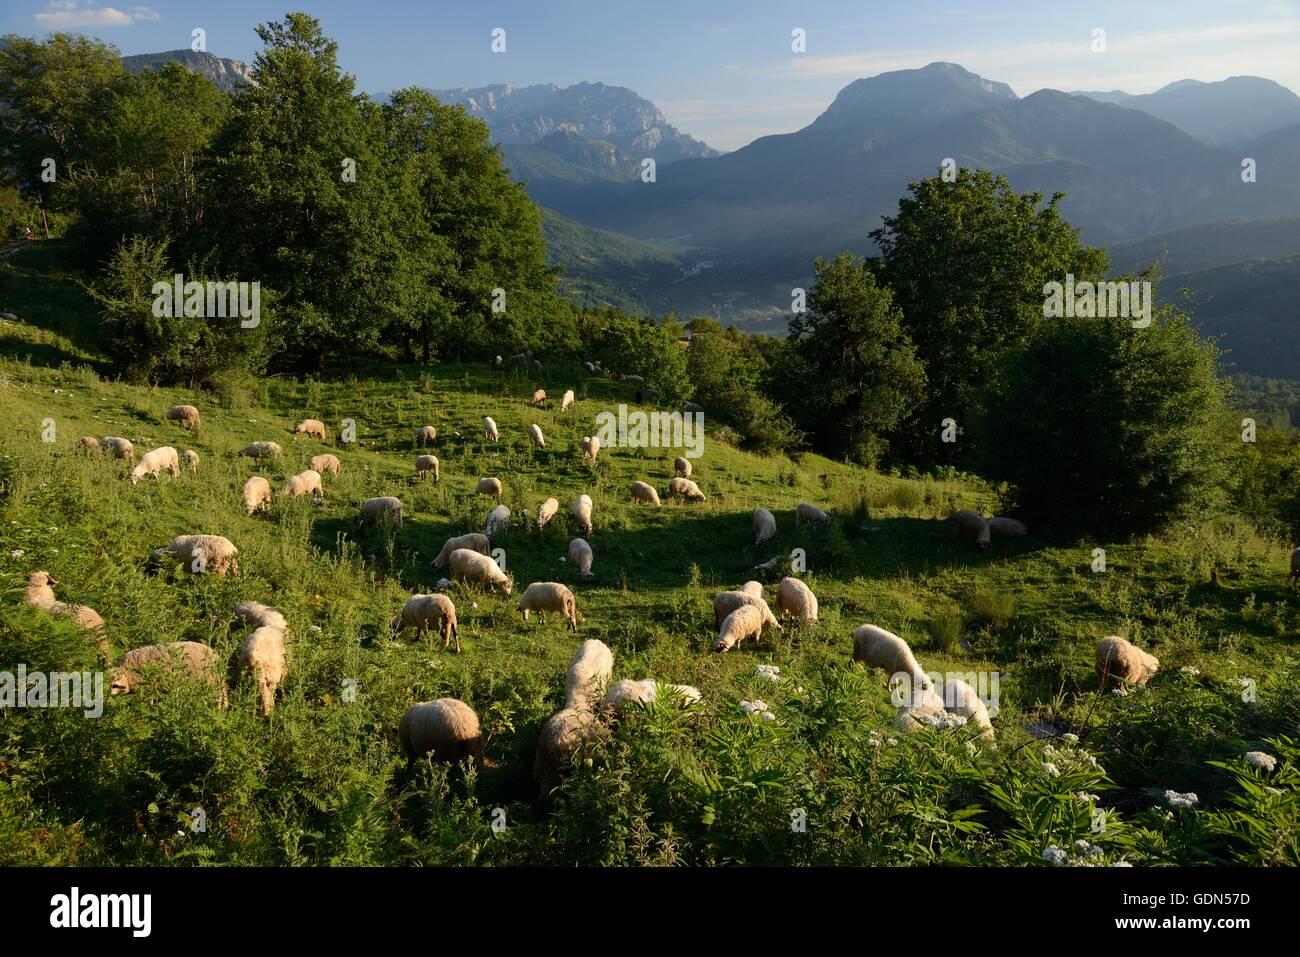 Sheep (Ovis aries) grazing alpine pastureland in Sutjeska National Park, Bosnia and Herzegovina. - Stock Image